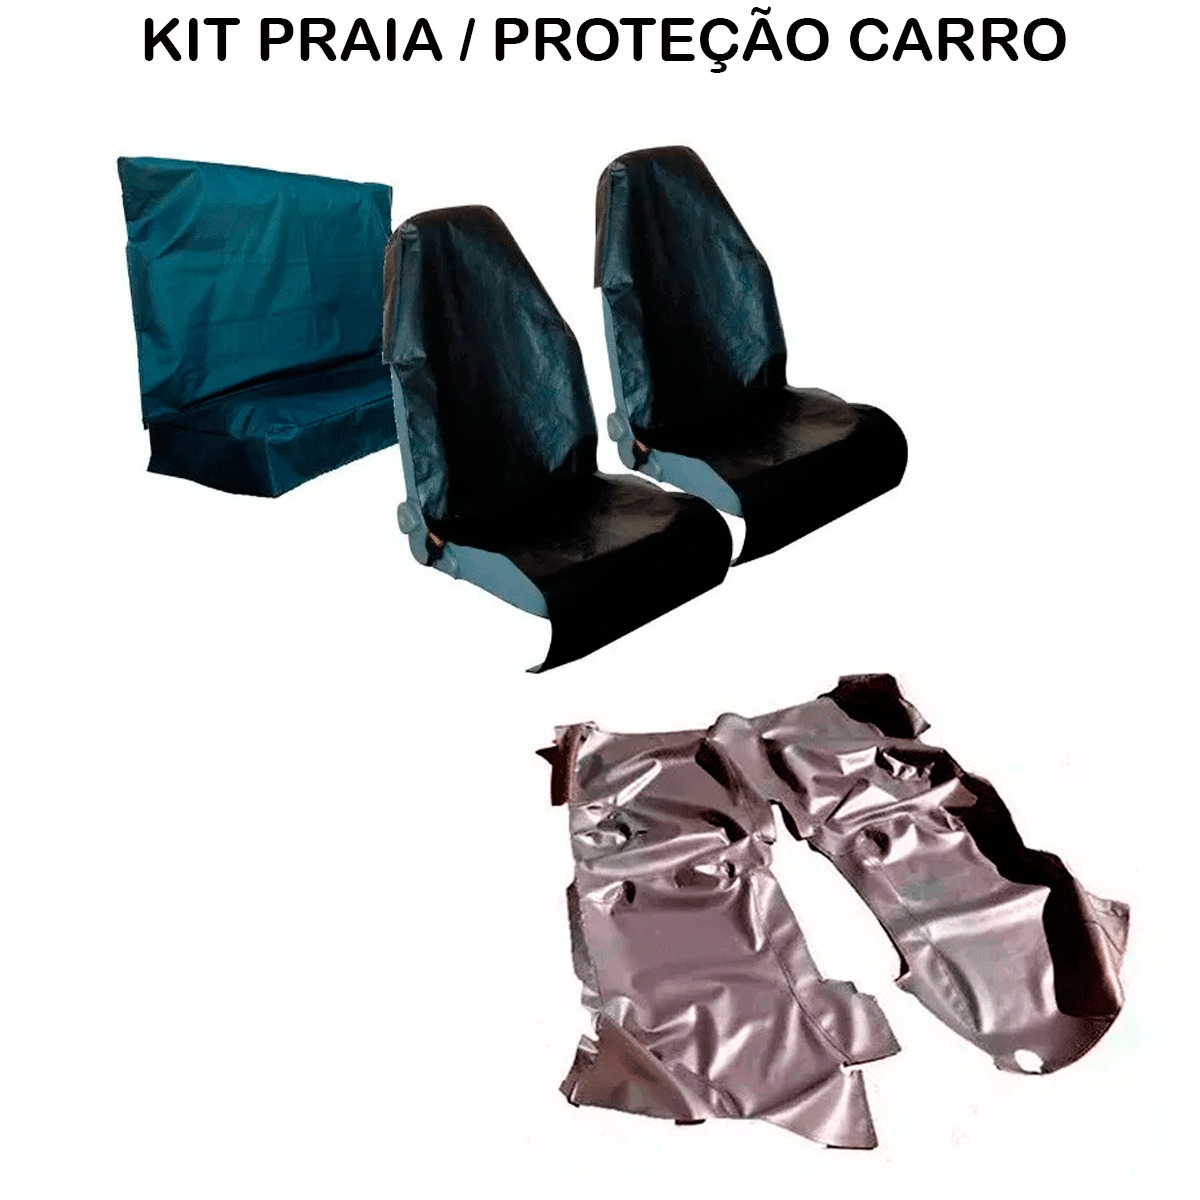 Tapete Em Vinil Volkswagen Gol G6 + Capa Banco Protecao Banco Areia Suor Academia